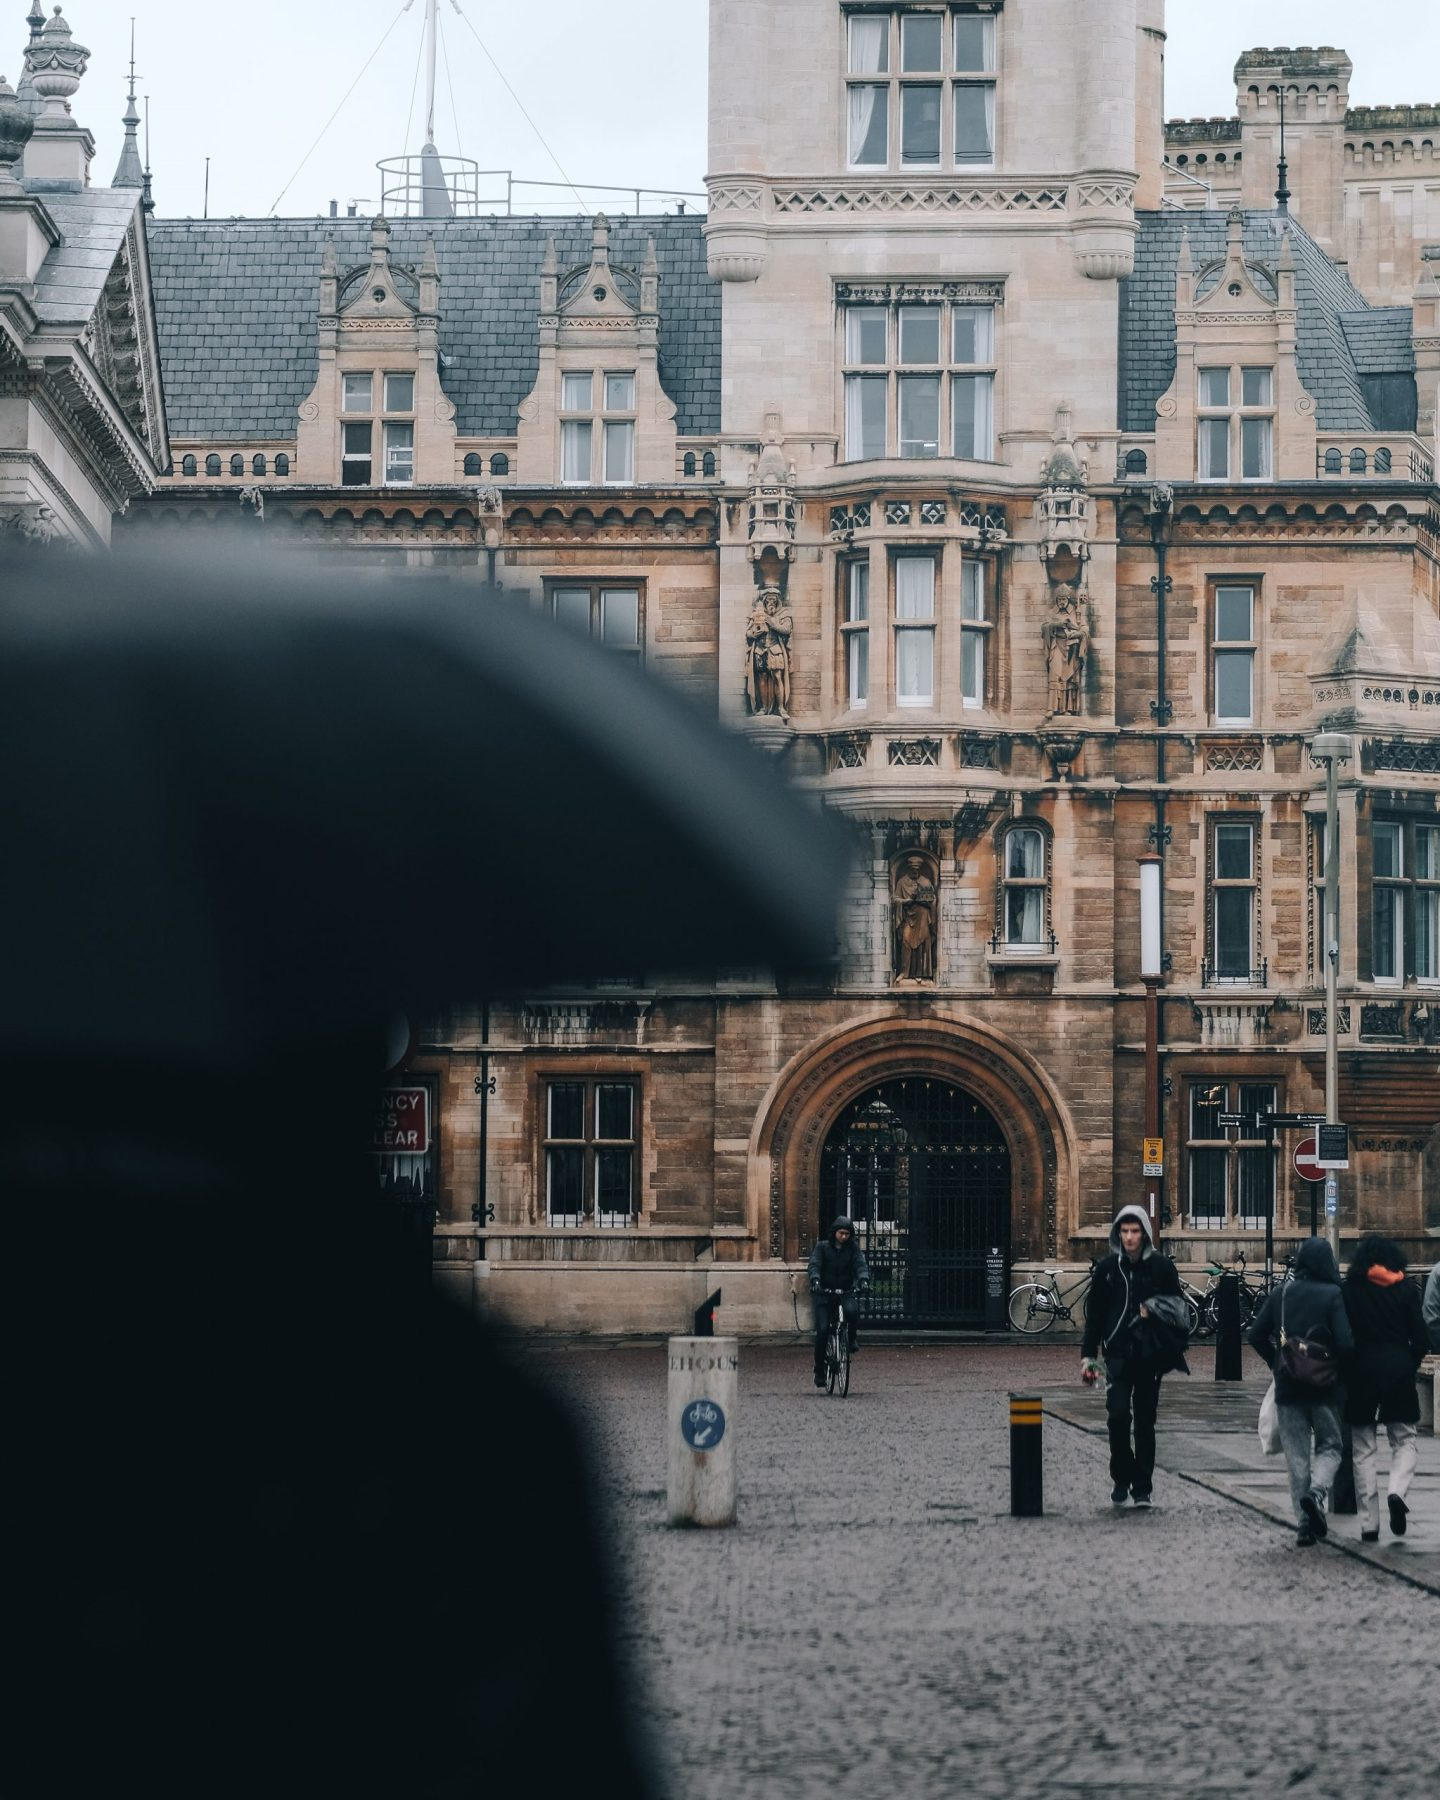 Cambridge, United Kingdom